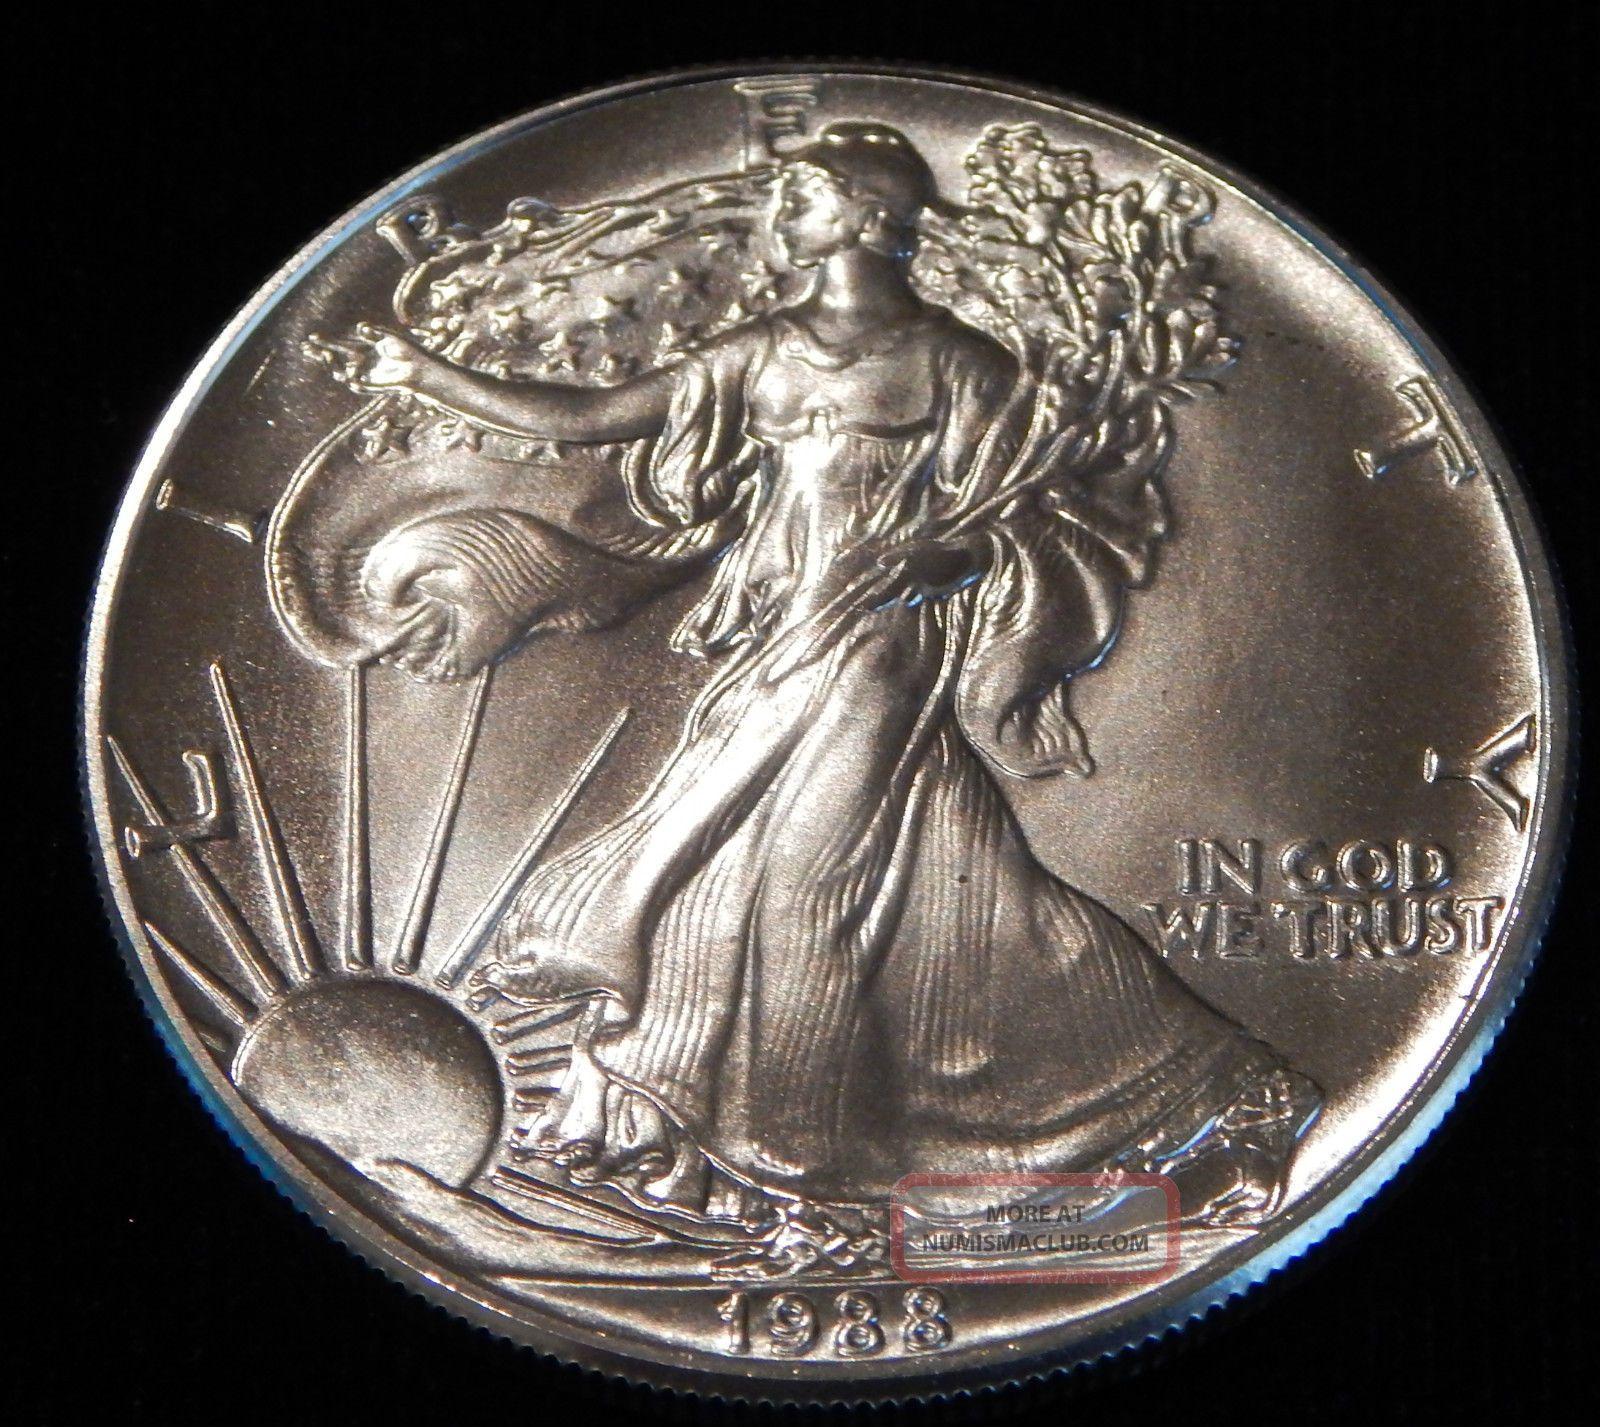 1988 American Silver Eagle Bullion Coin Rare Key Date